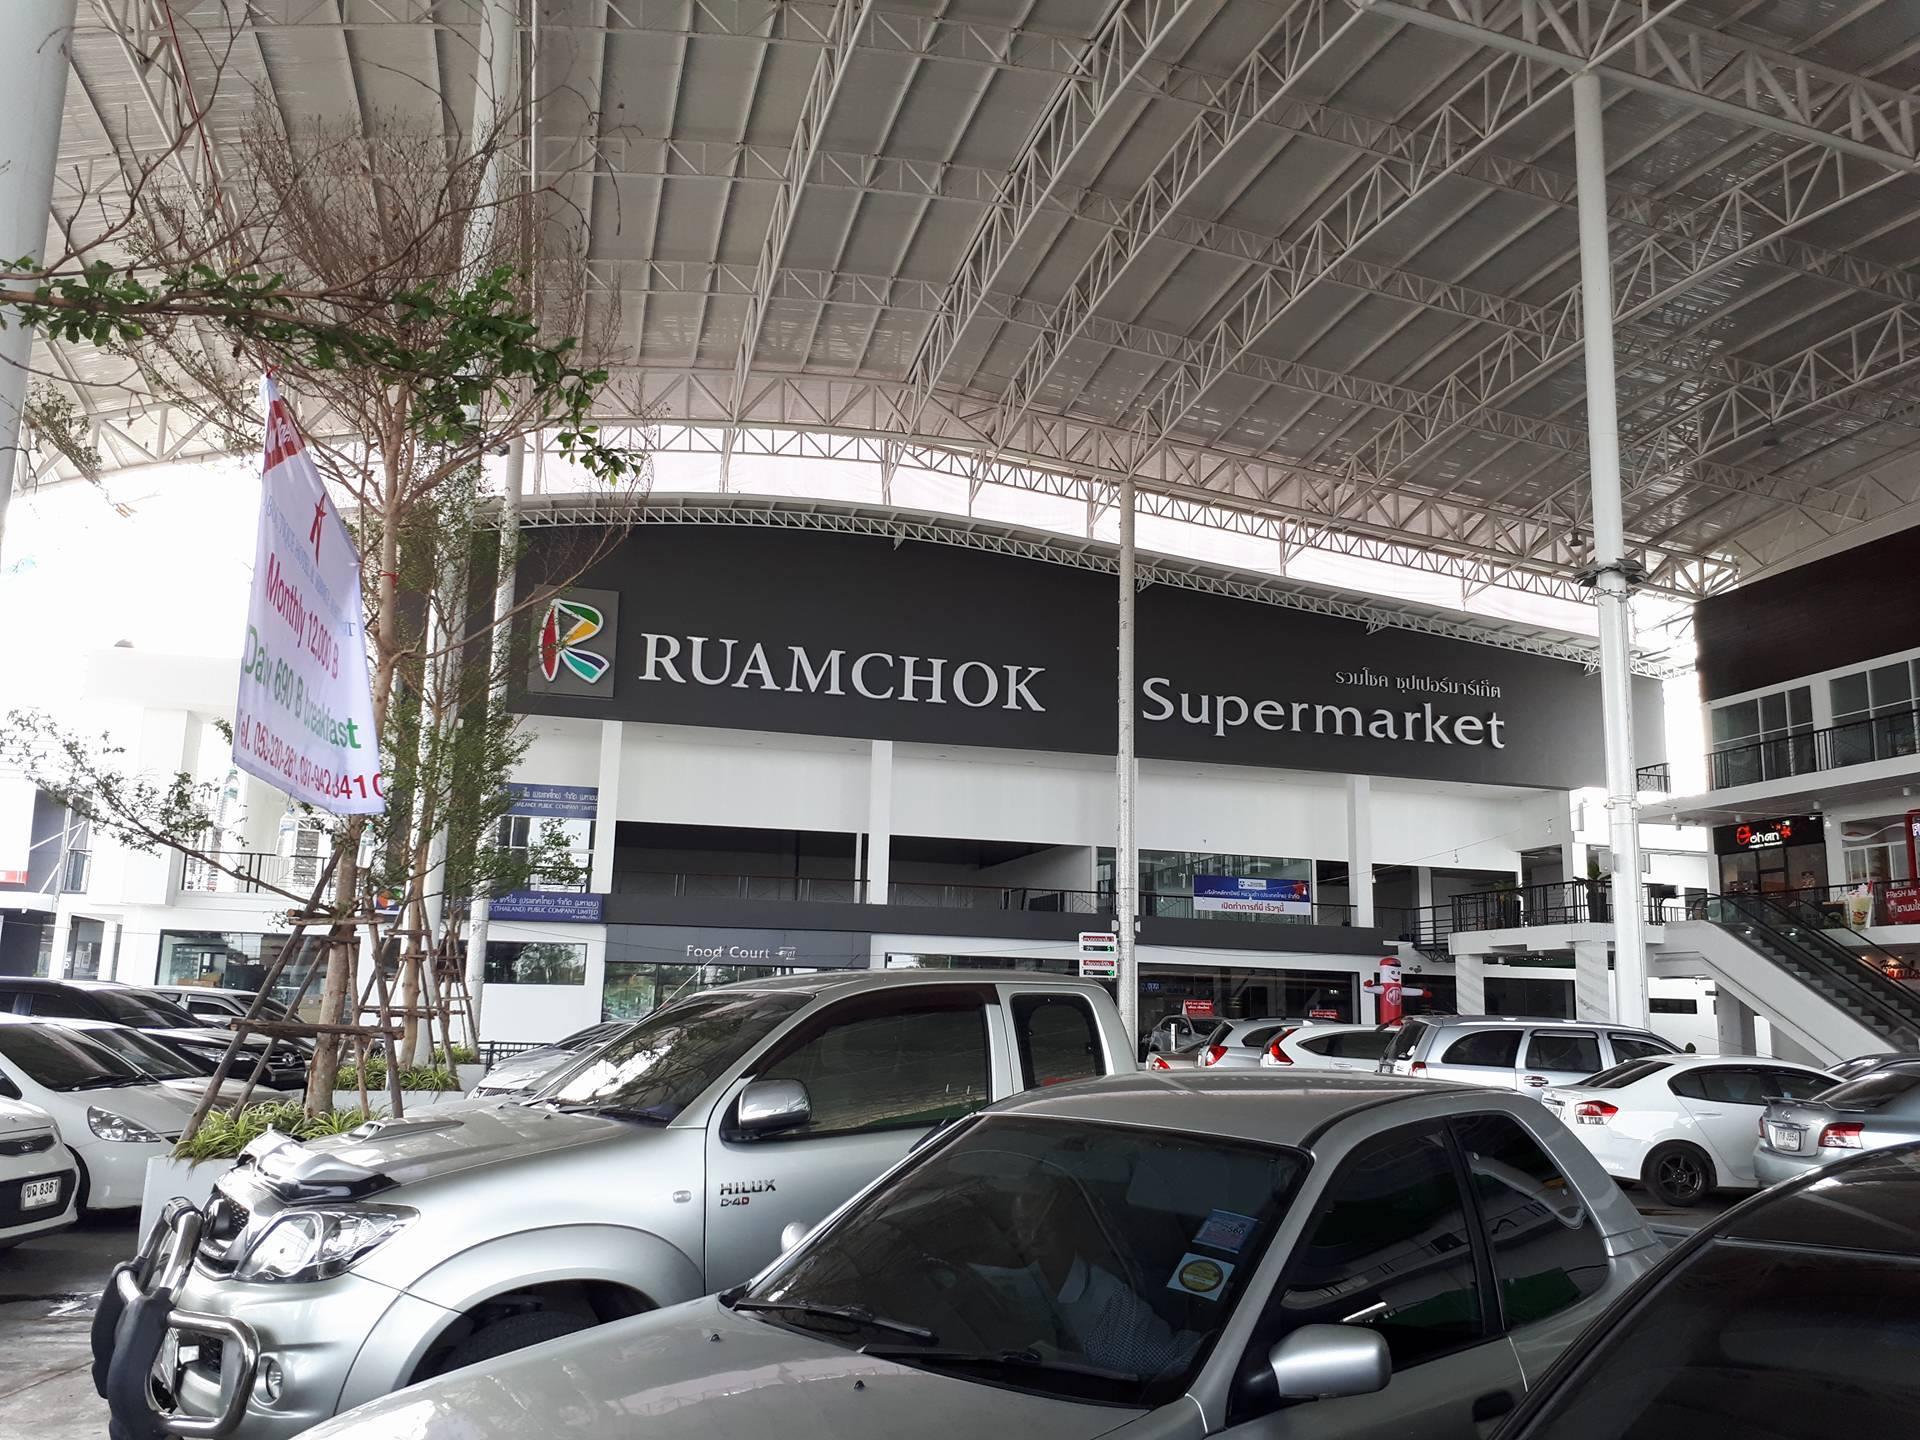 Ruamchok Mall